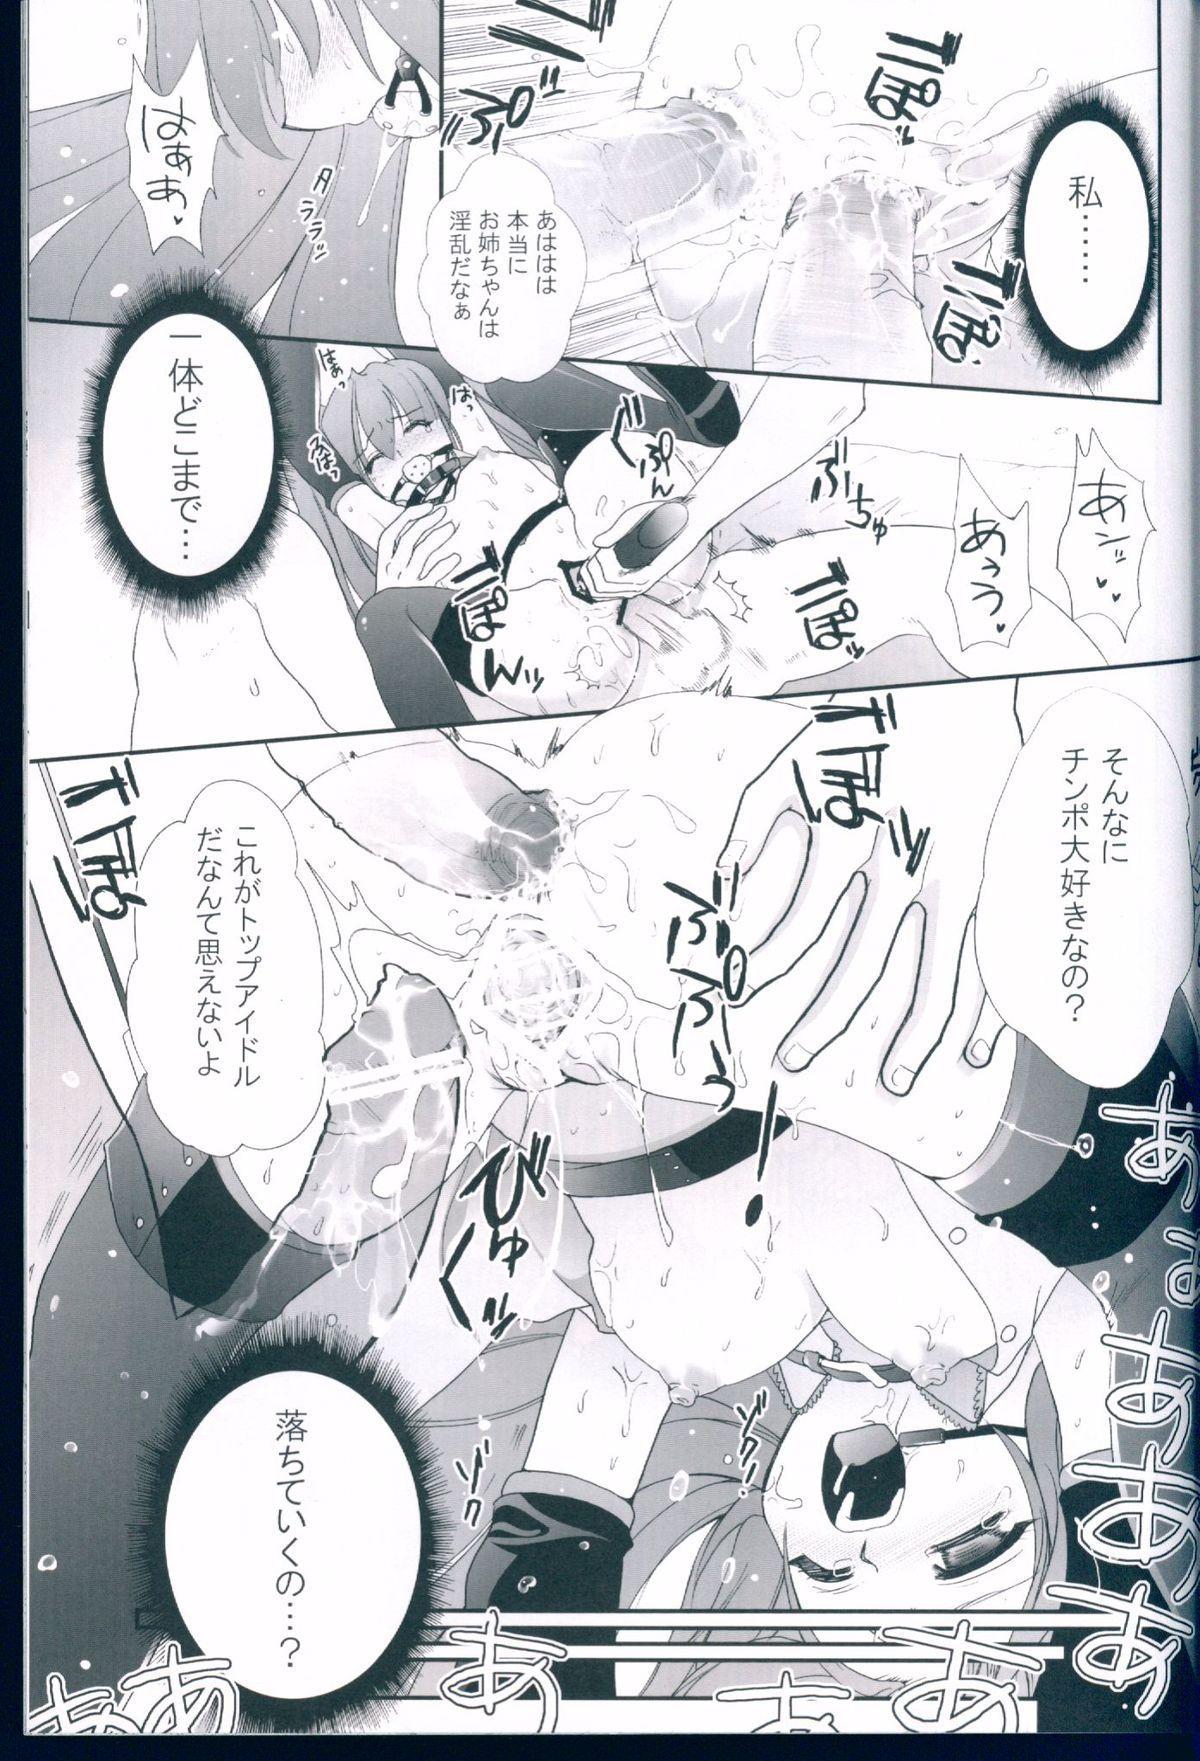 R Juu - Hatsune Miku Kenkan 18